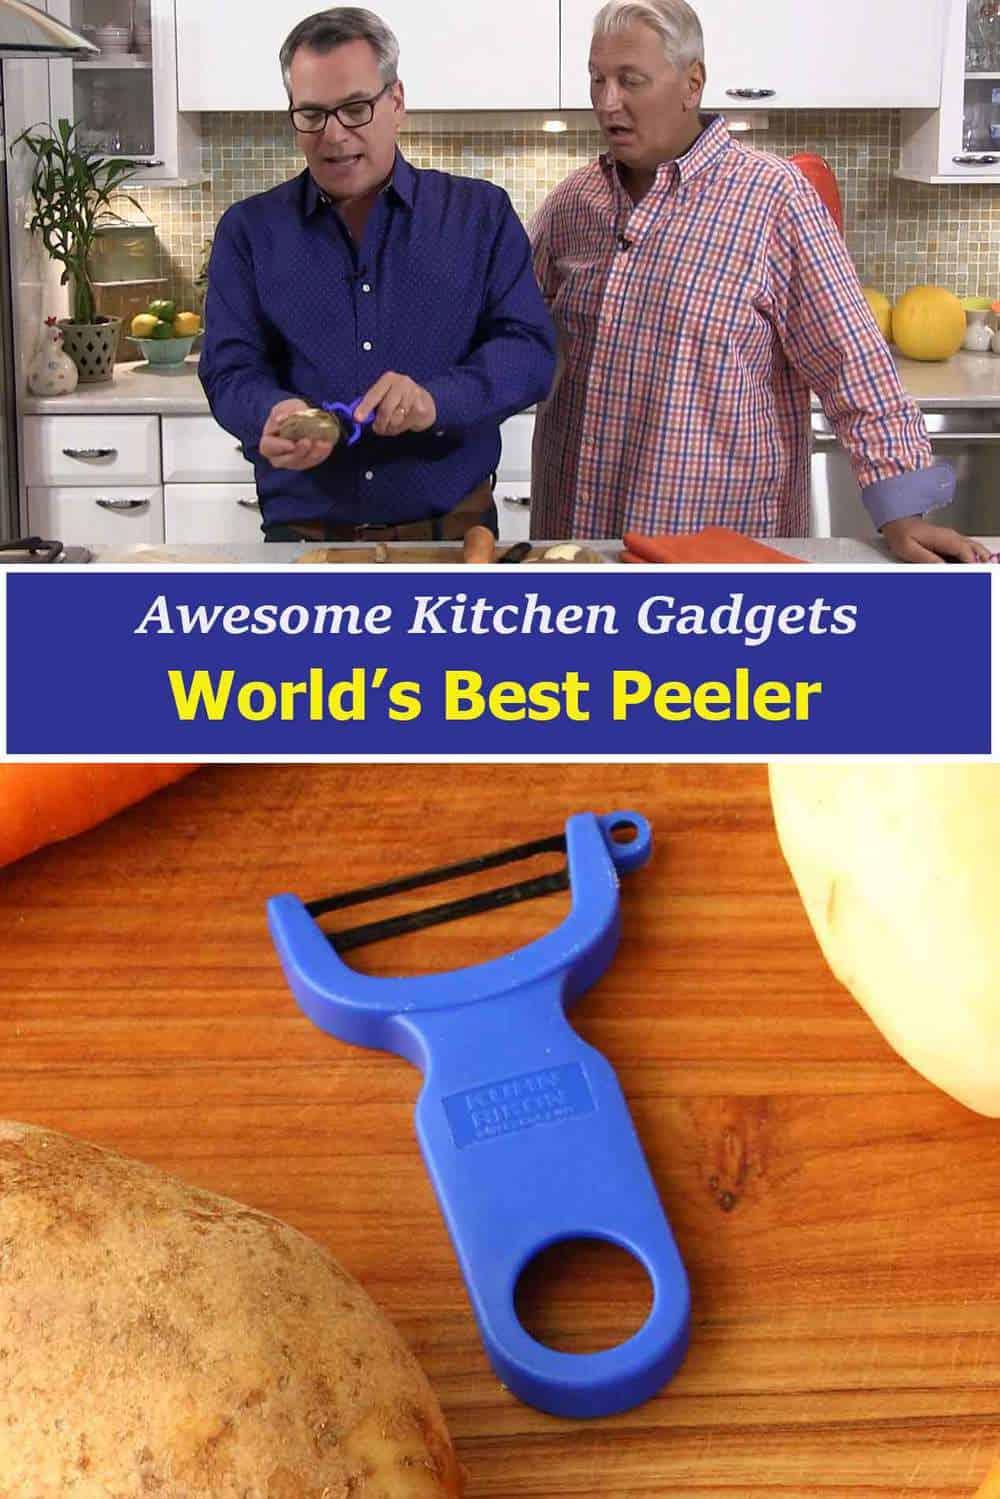 Awesome Kitchen Gadgets Veggie Peeler